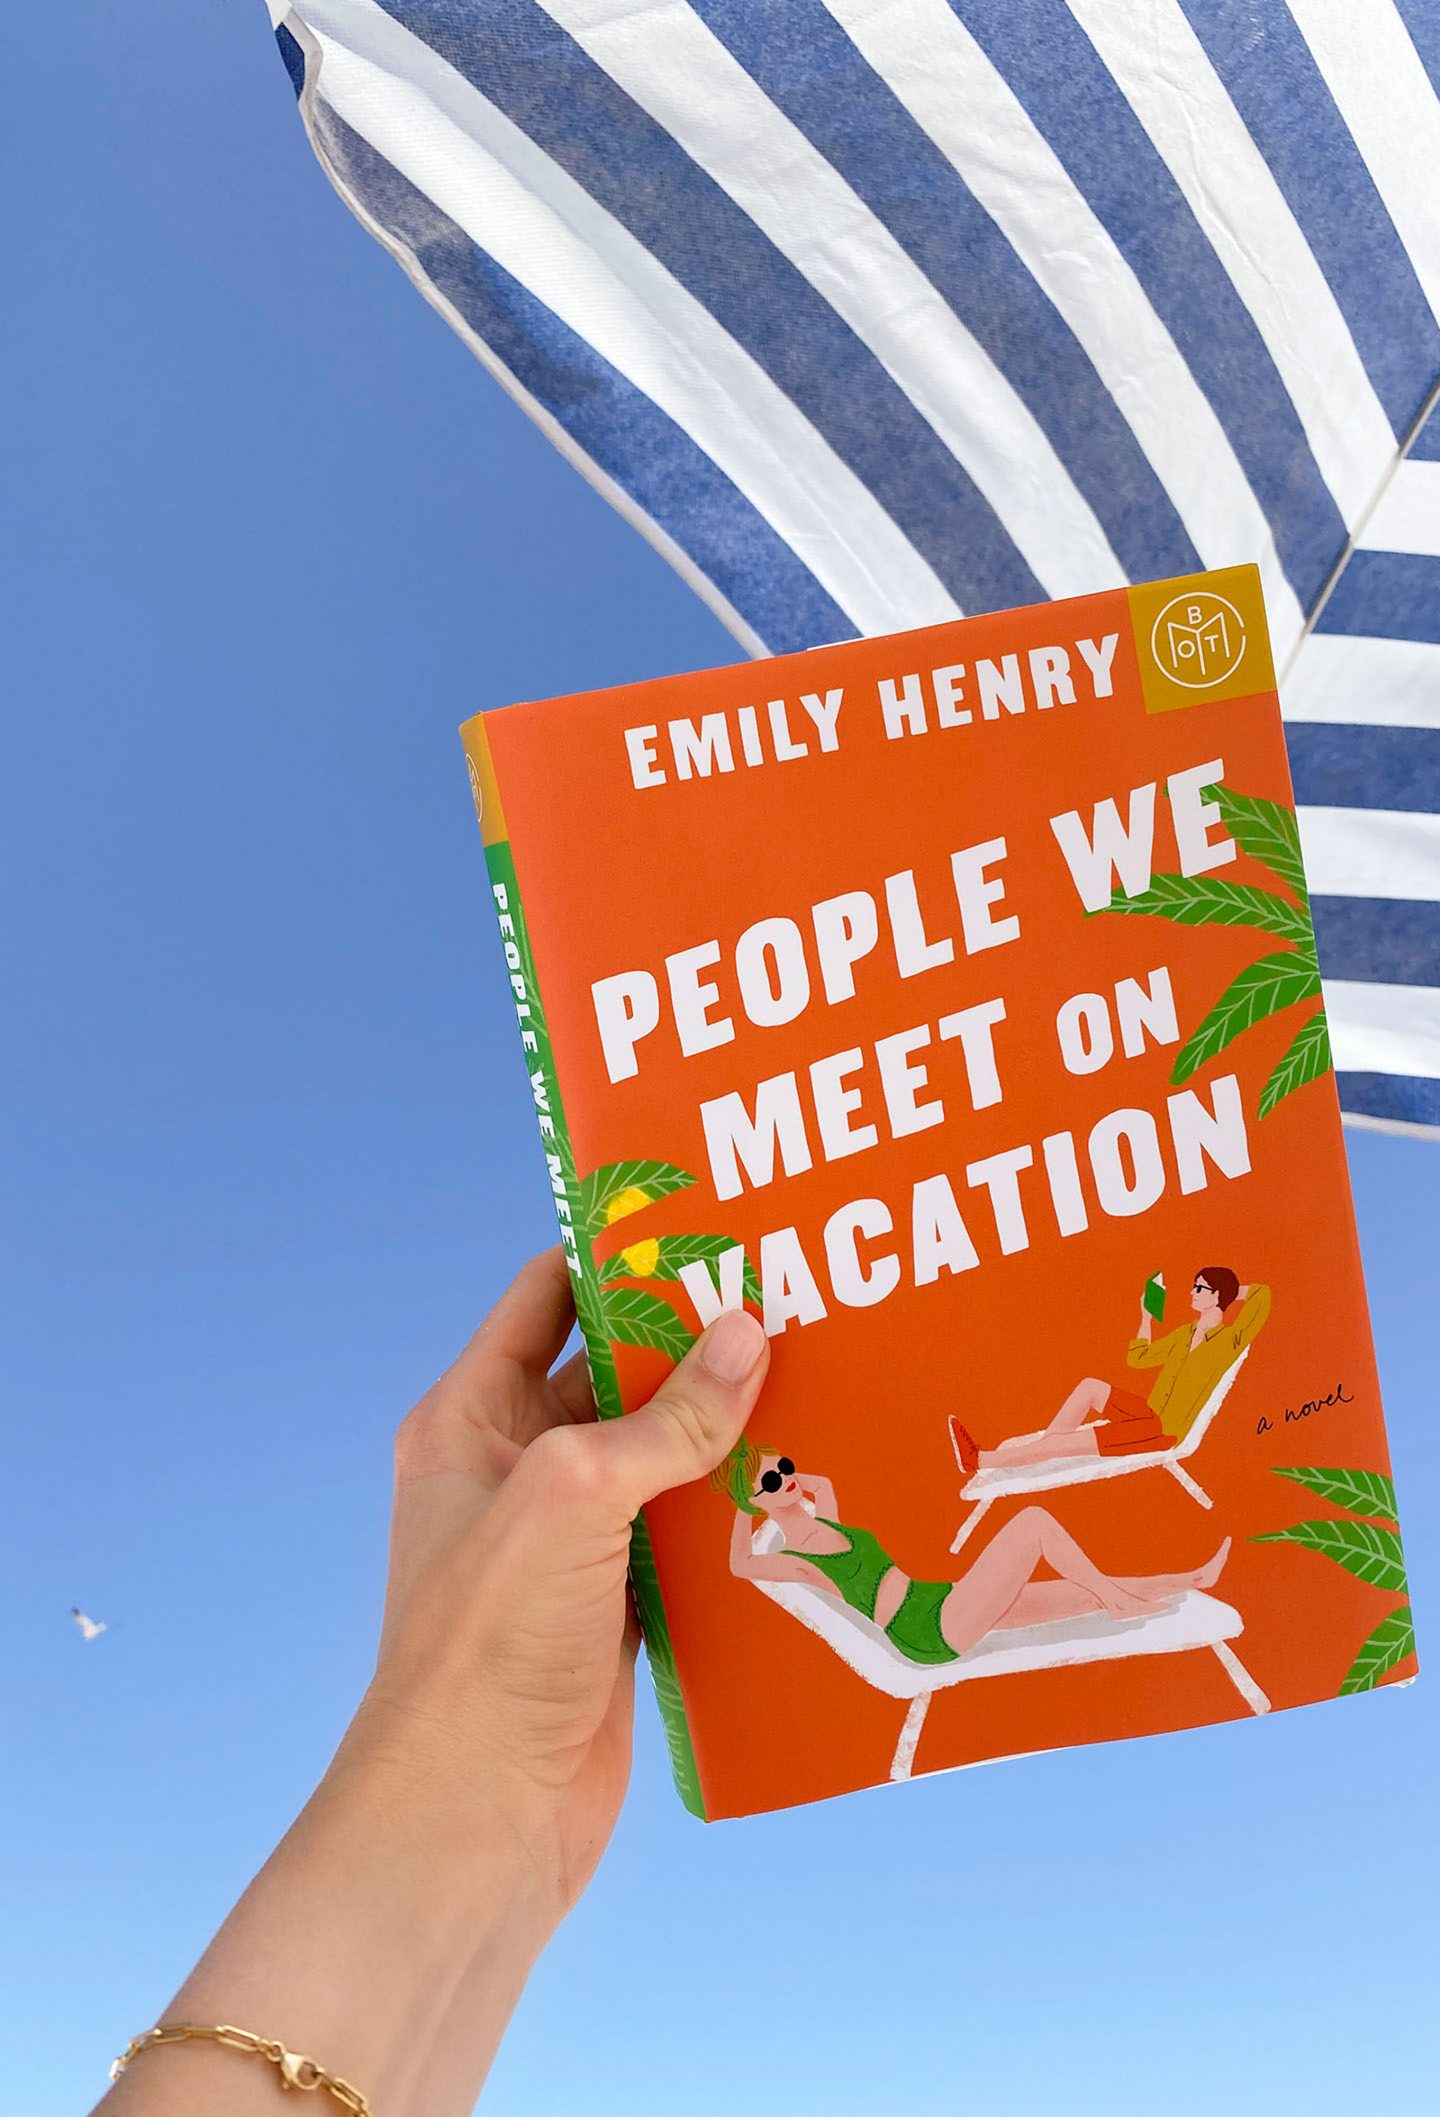 June's Book: People We Meet on Vacation